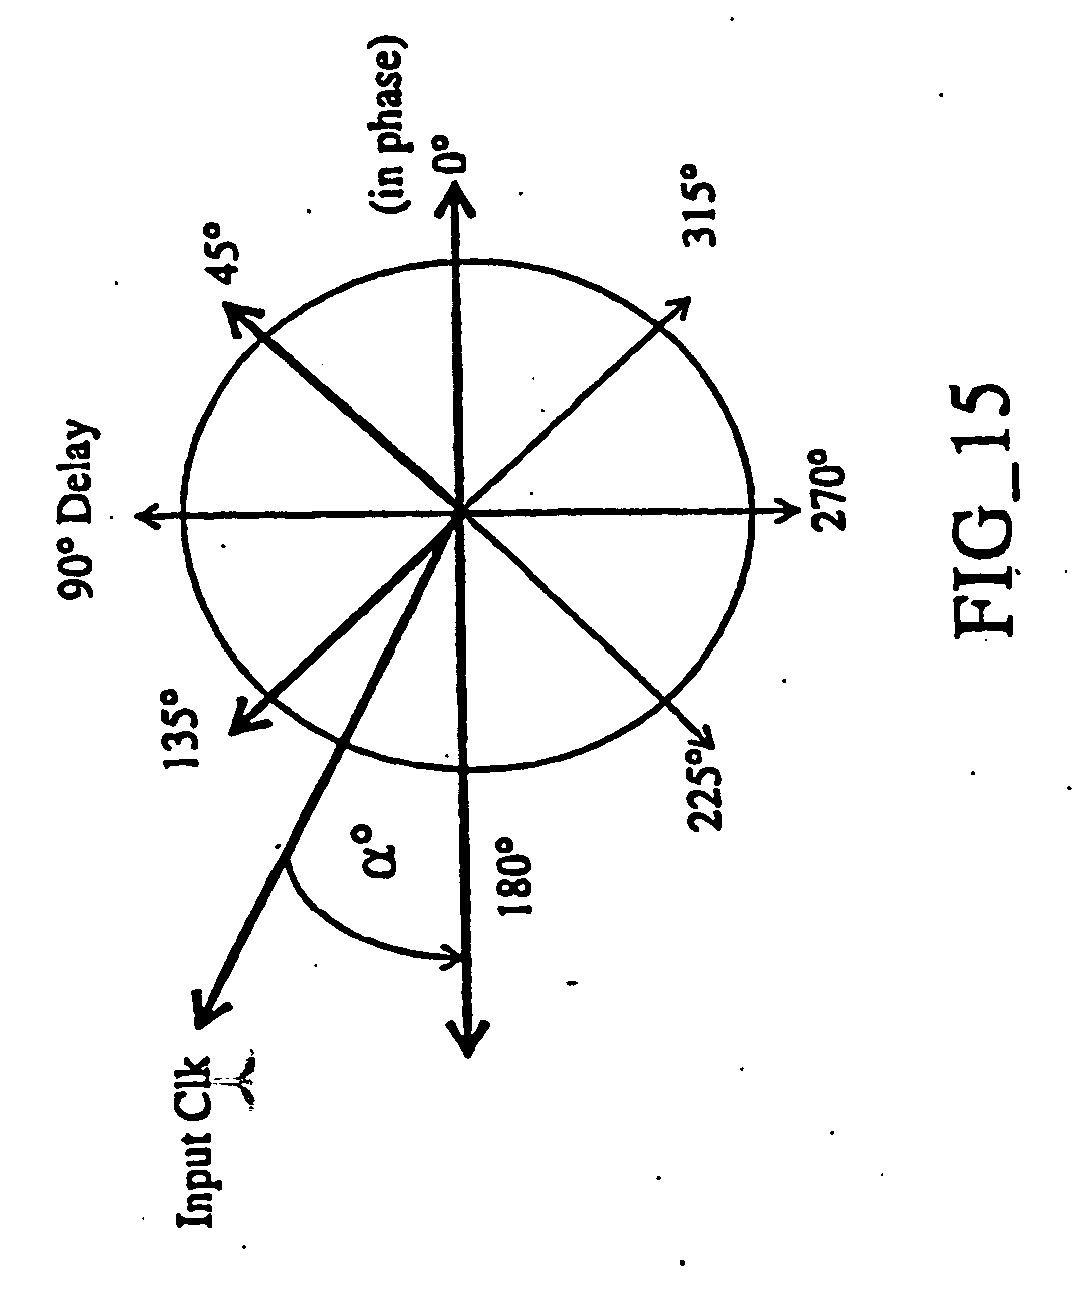 patent ep1601130b1